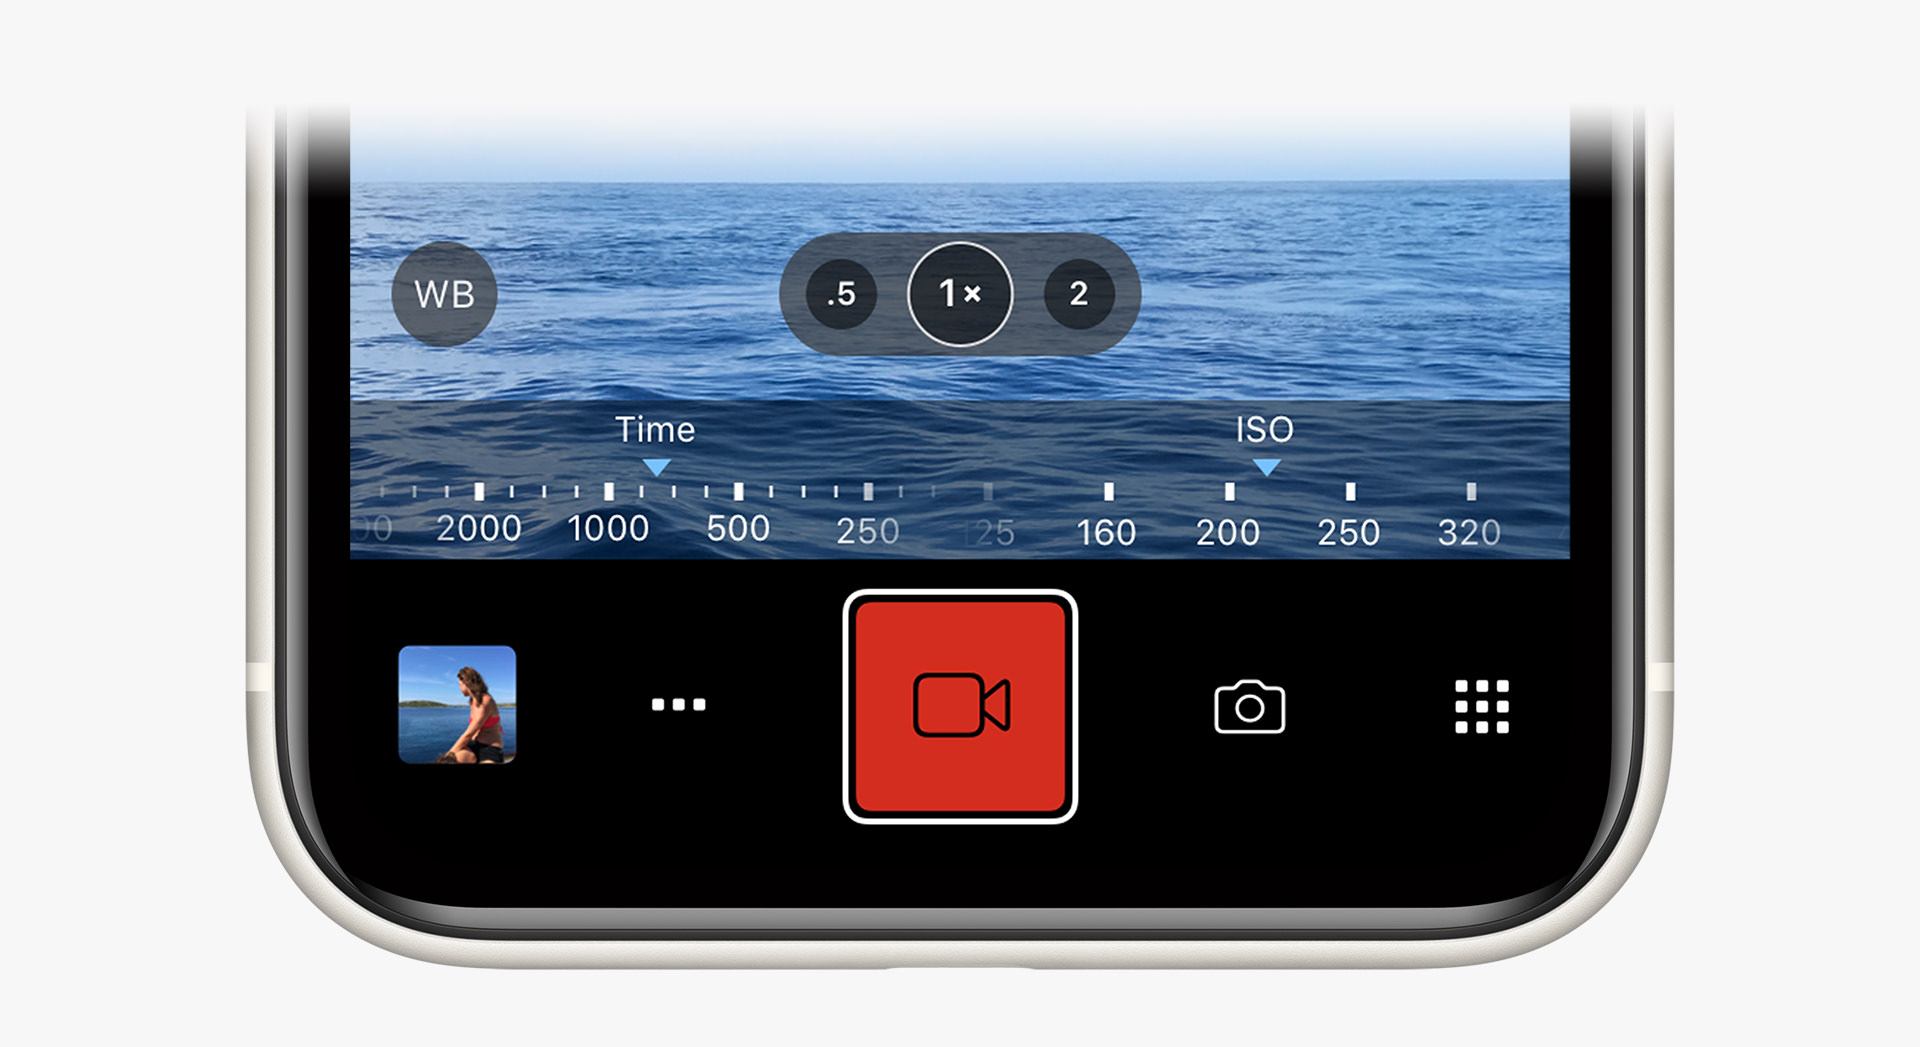 Manual Exposure Controls in ProCamera's Video Mode